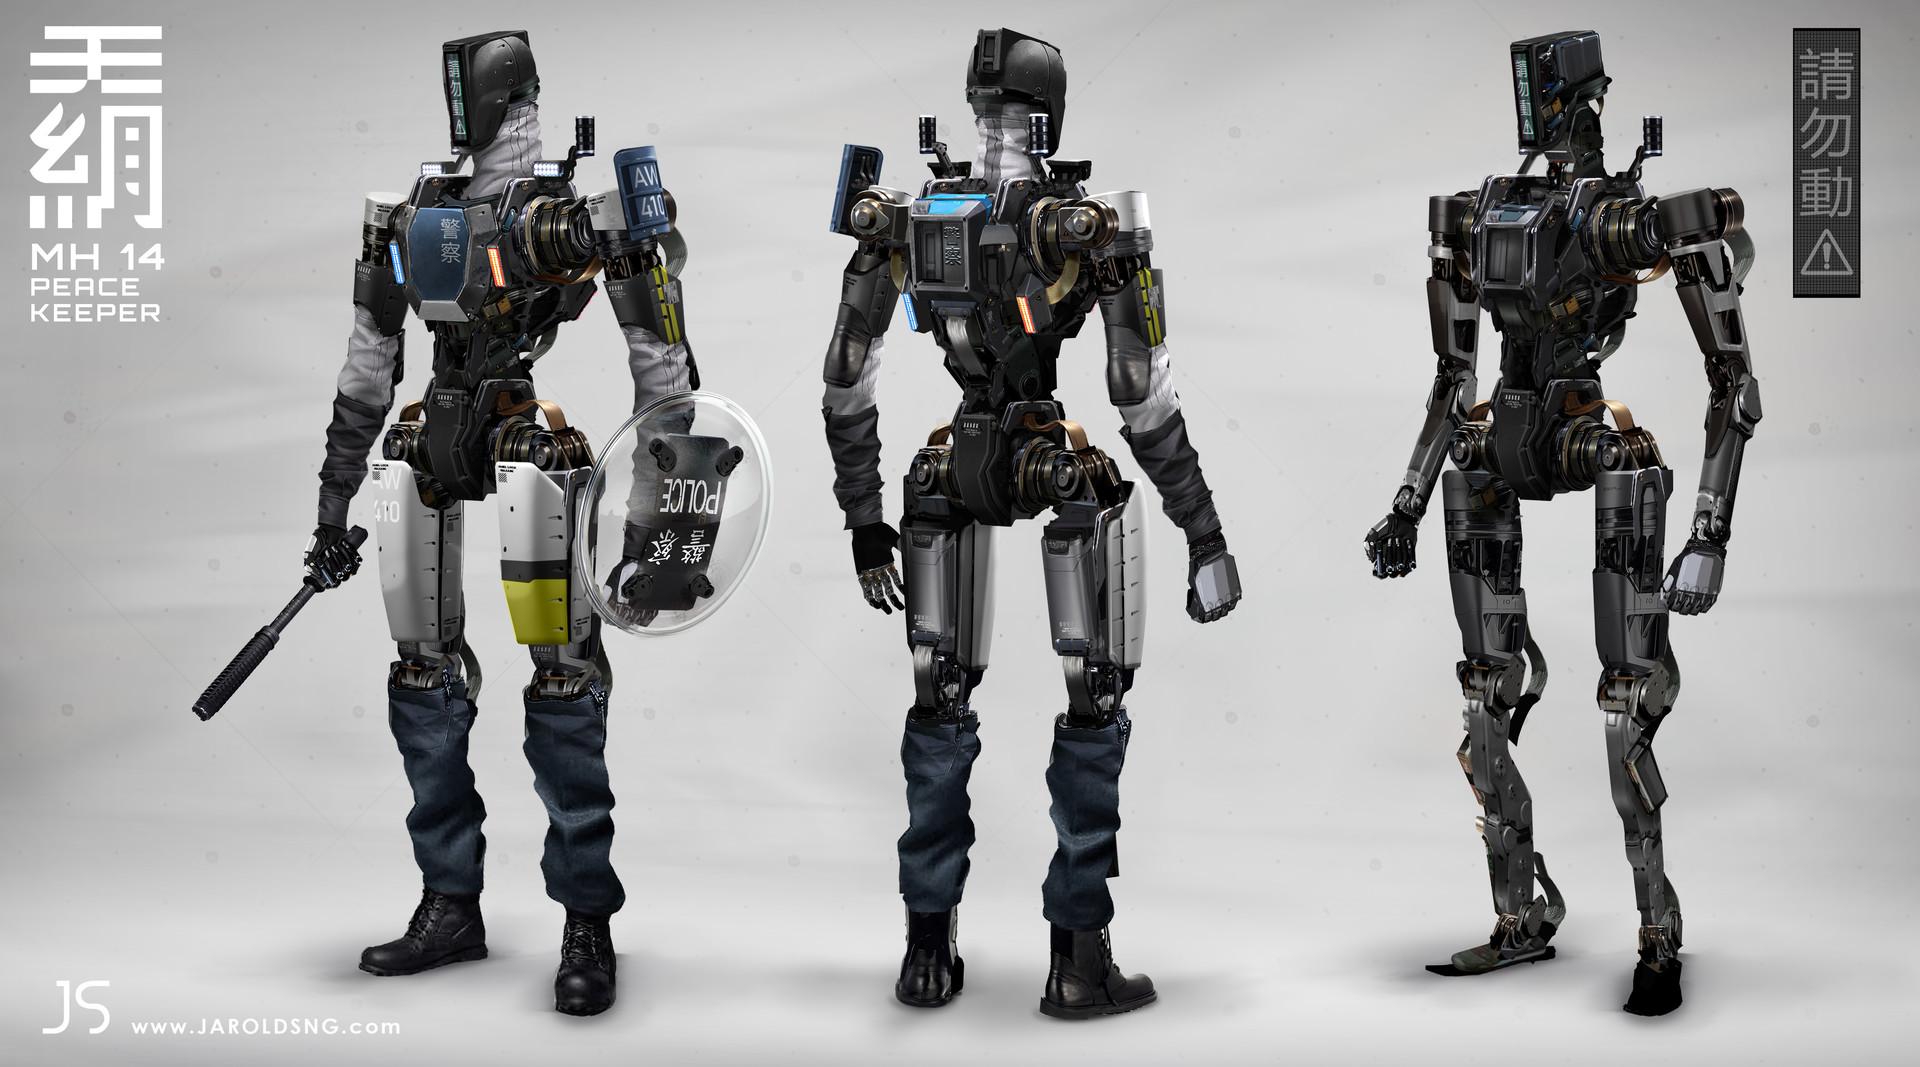 Jarold sng metalhex wa peacekeeper 01